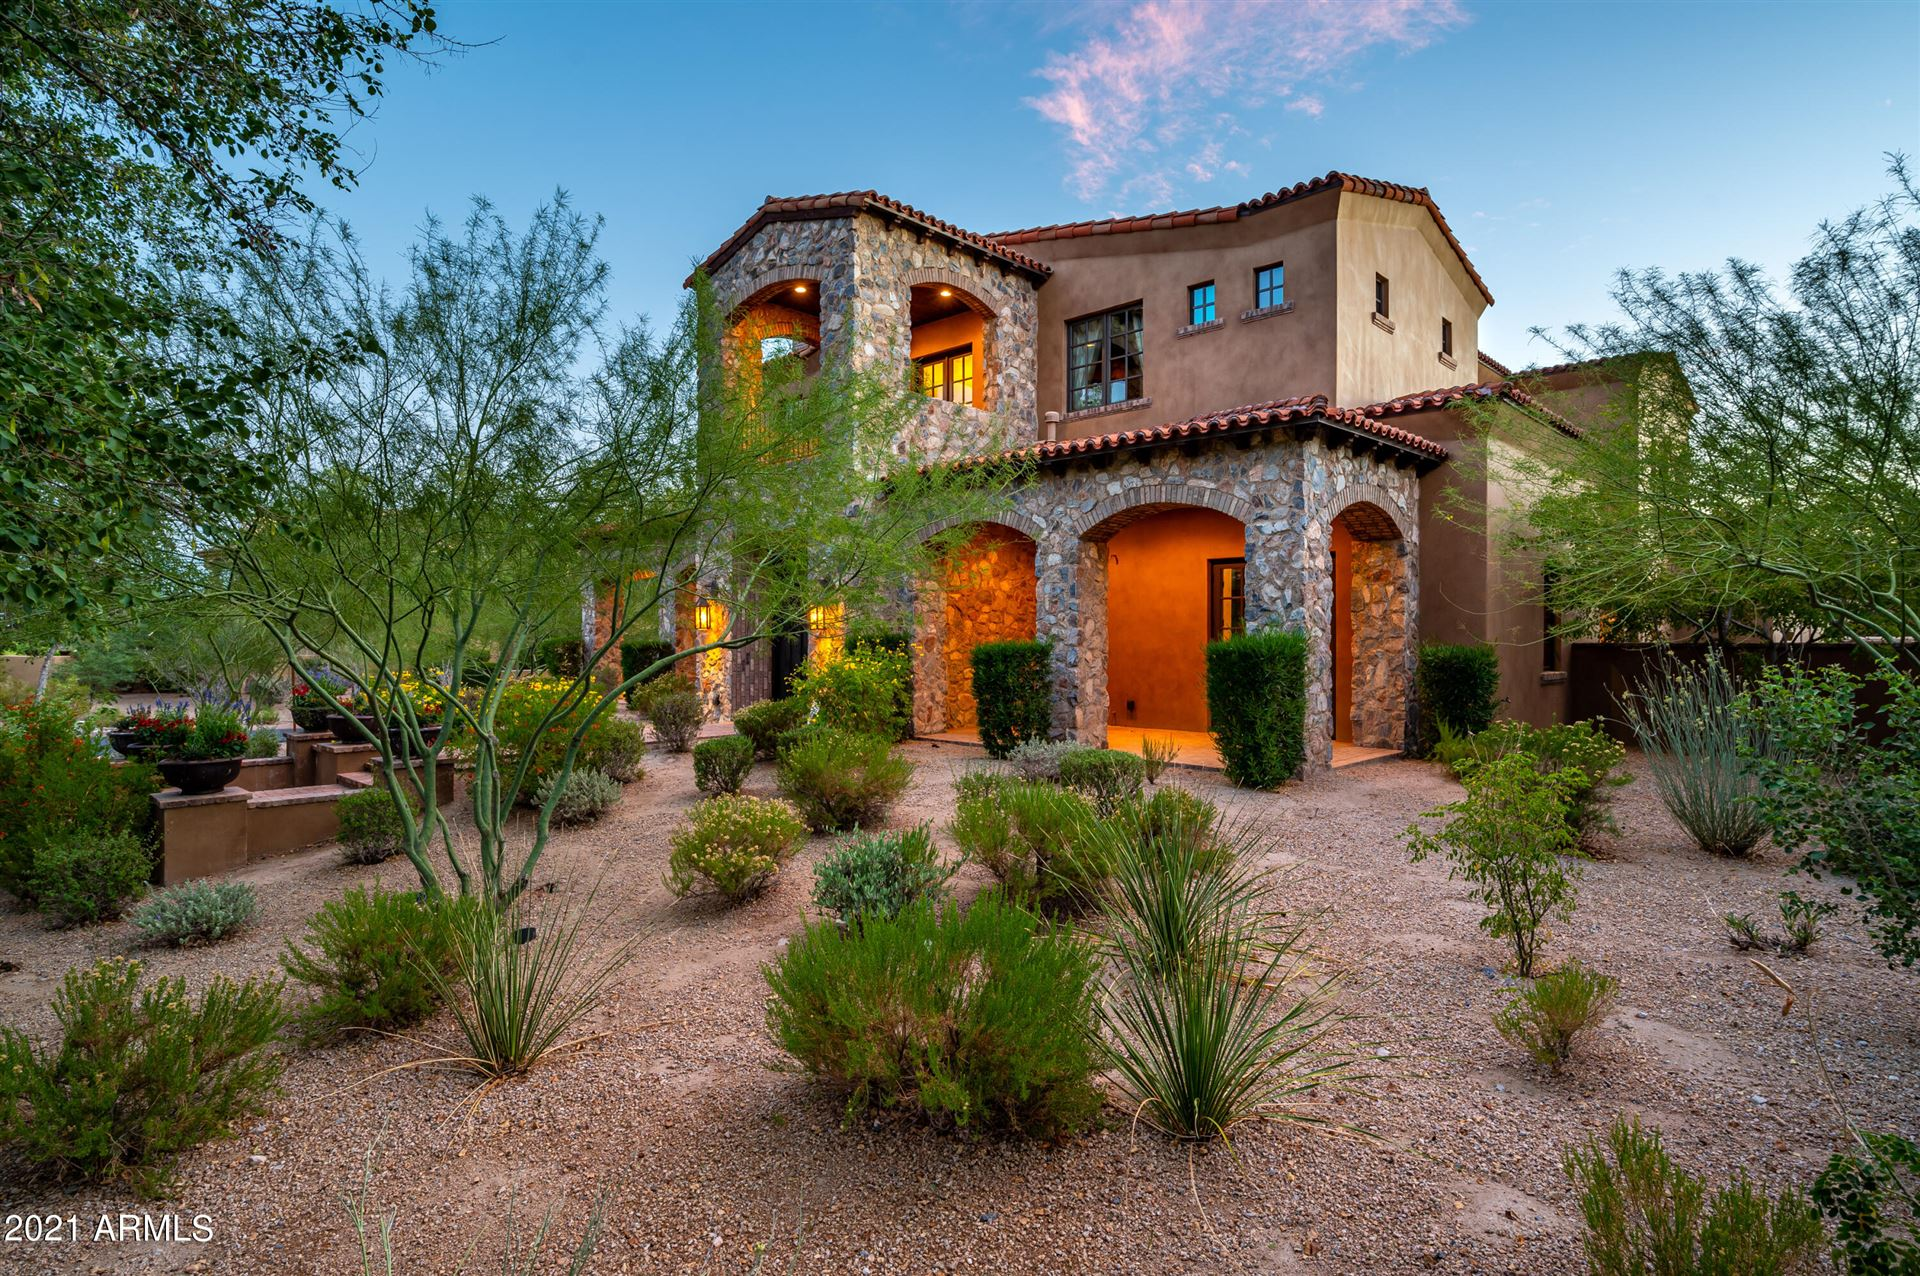 Photo of 18852 N 98TH Street, Scottsdale, AZ 85255 (MLS # 6249668)